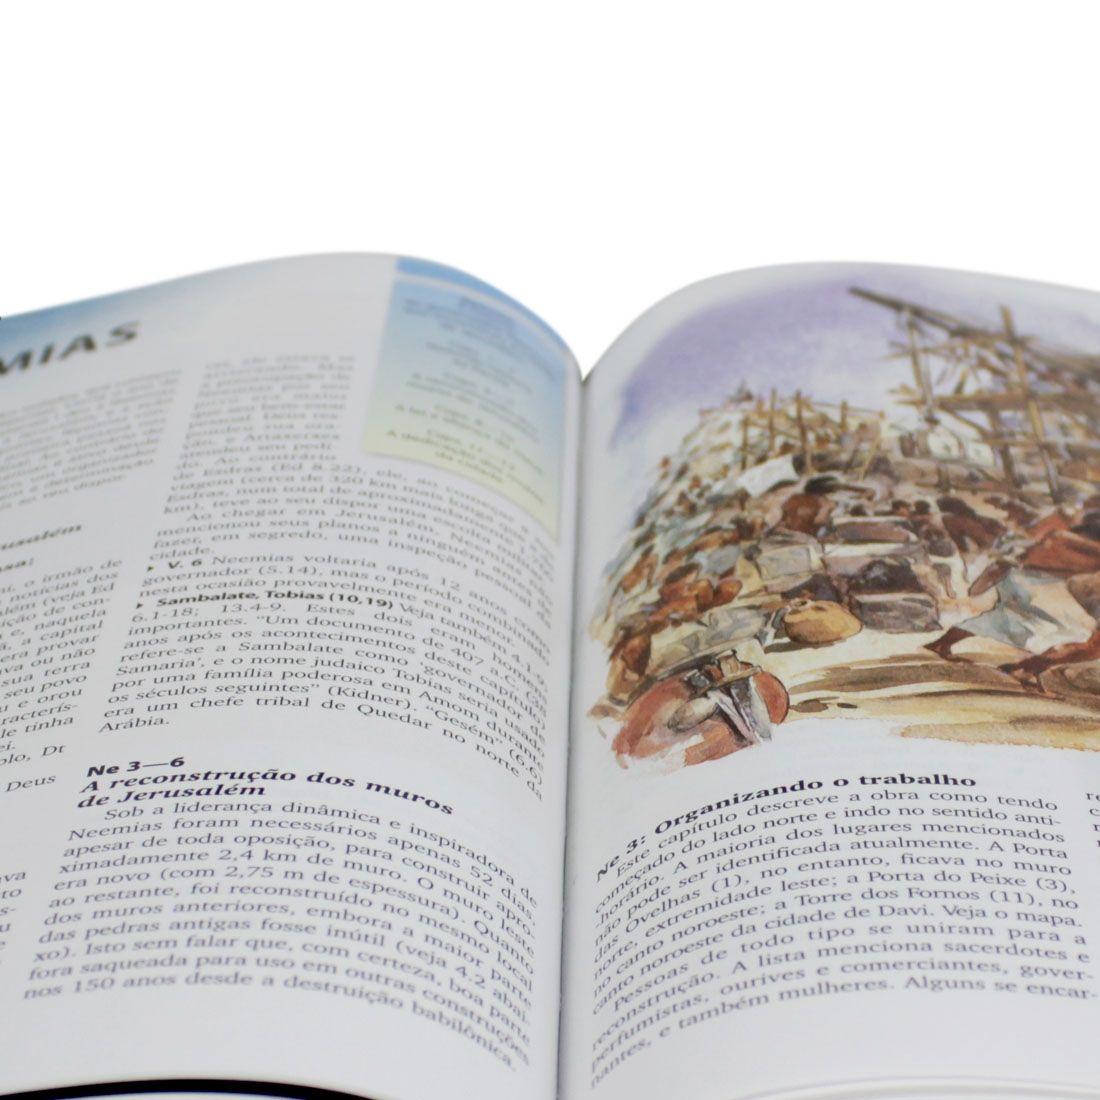 Kit Bíblia Sagrada Letra Gigante Capa Couro Azul/Cinza + Manual Bíblico SBB 3ª Edição